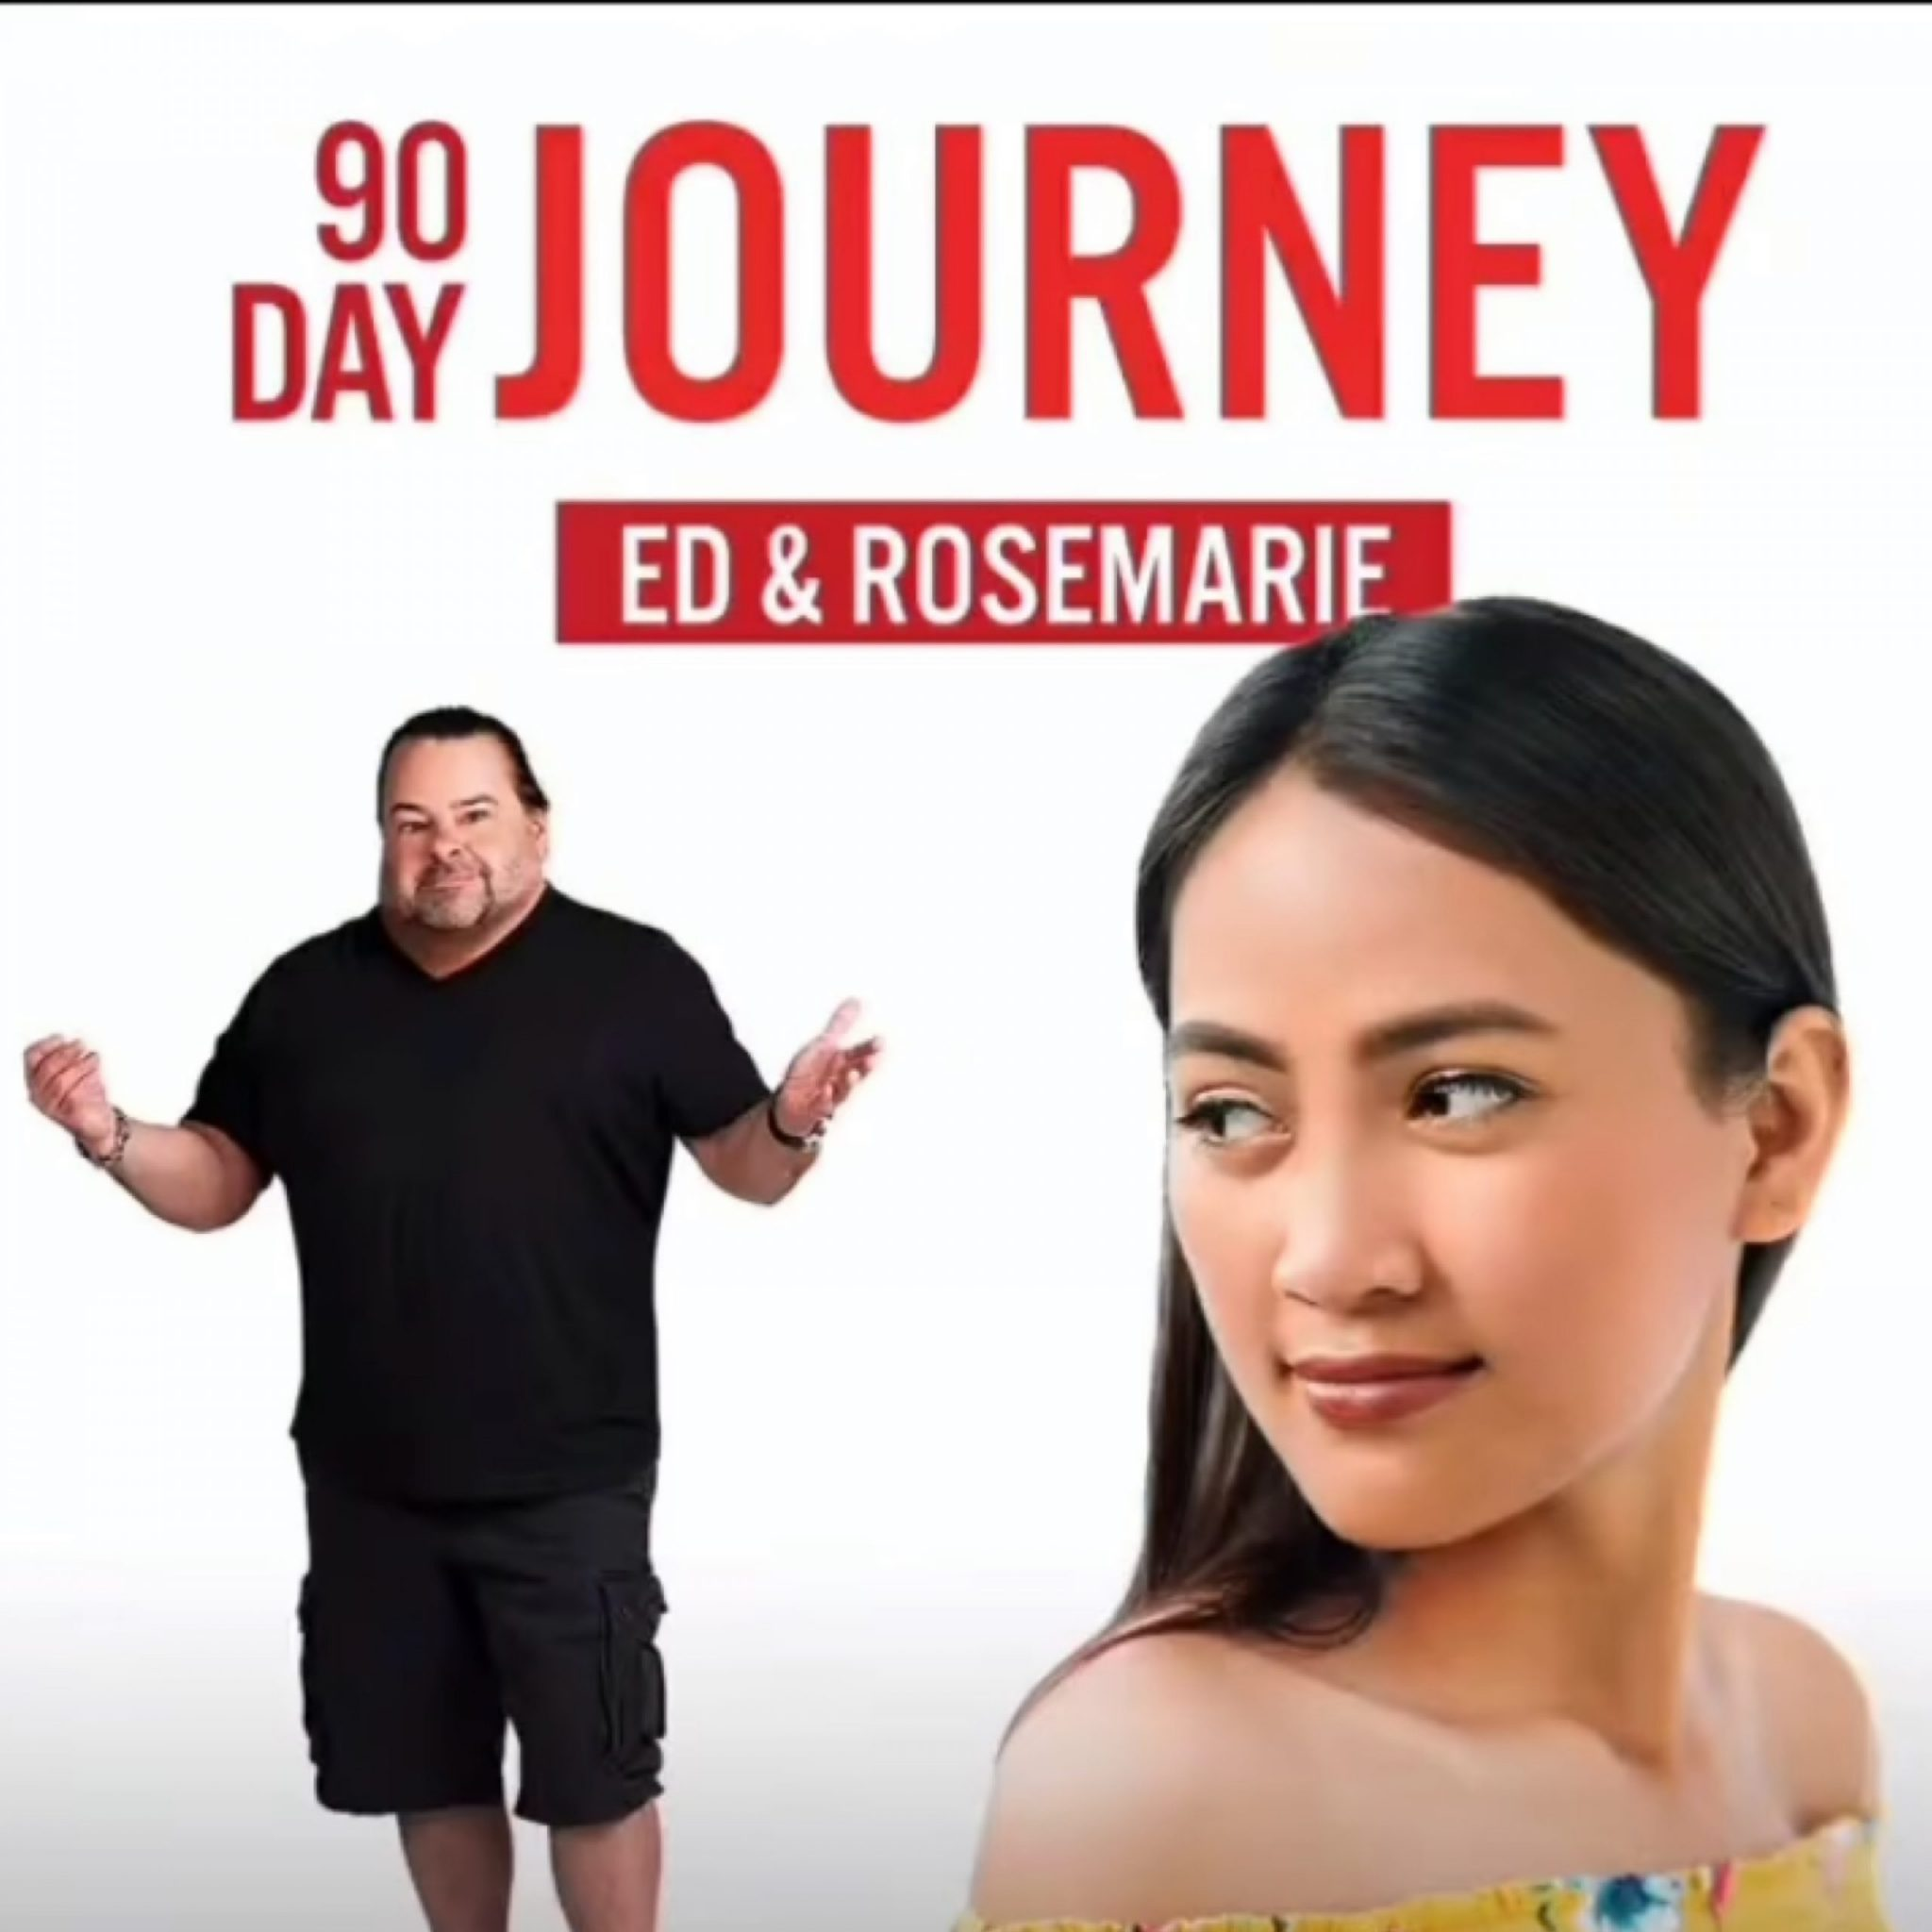 90 Day Fiance Credit: Big Ed Instagram